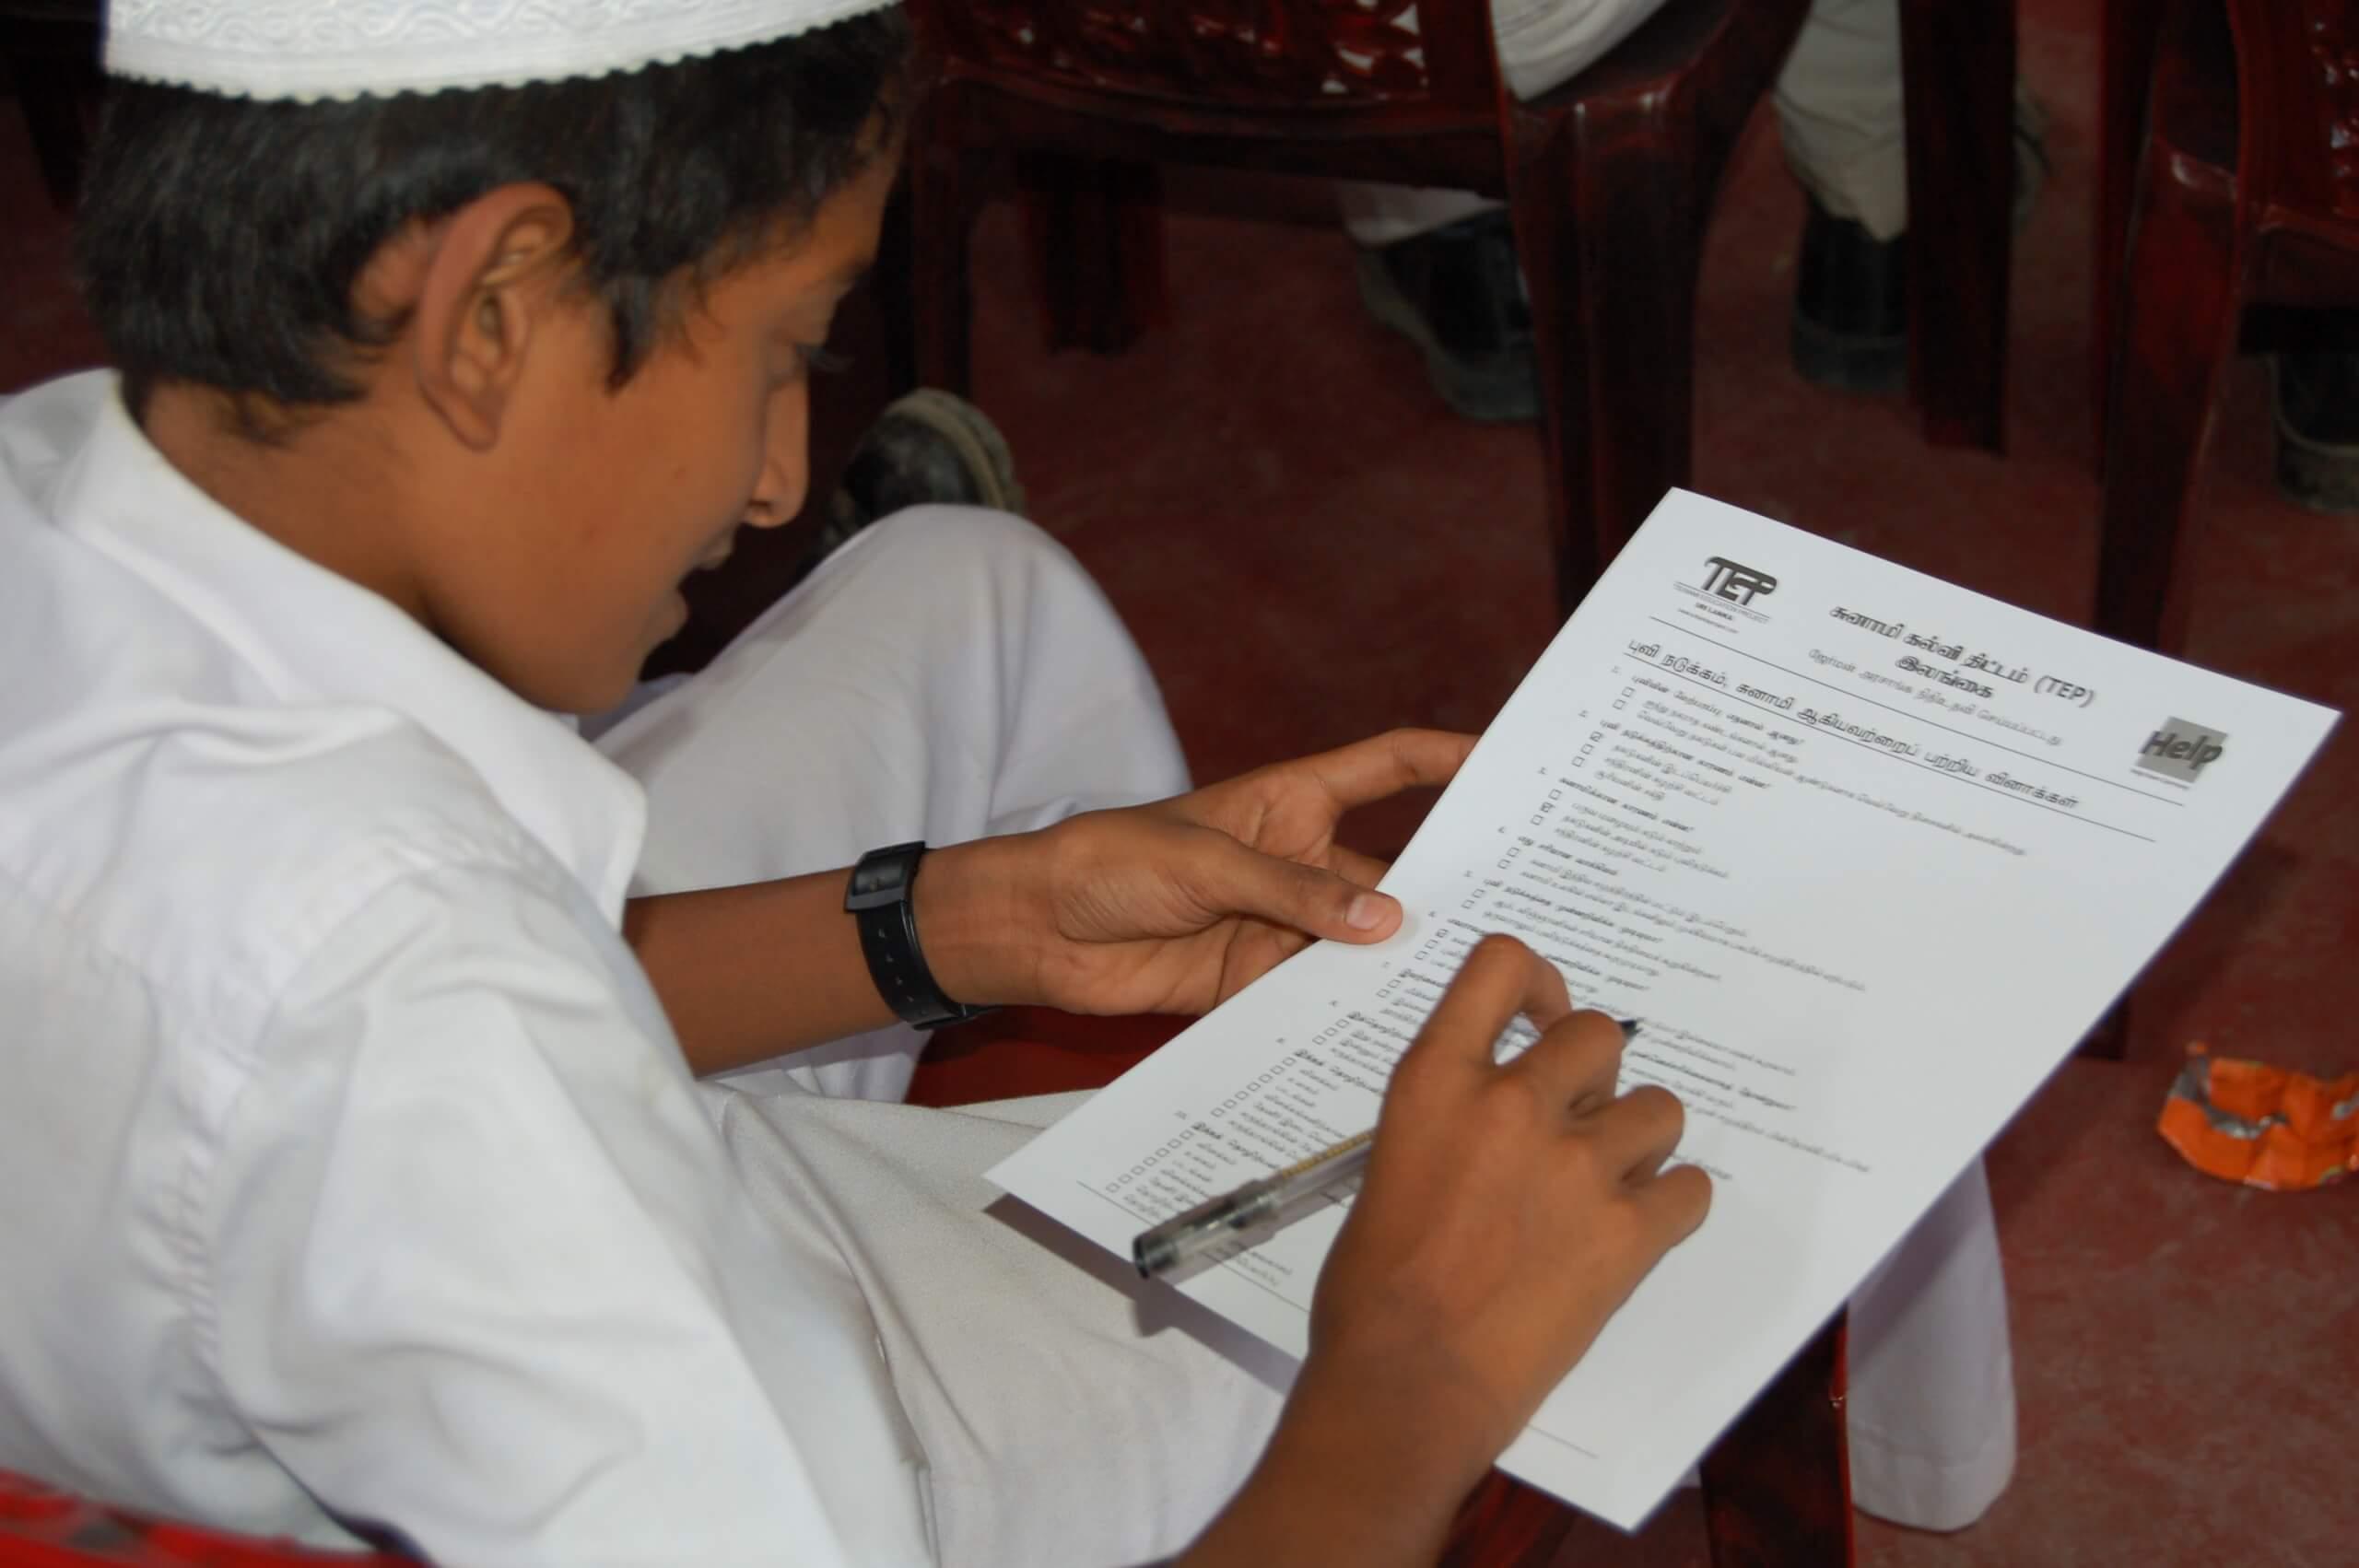 Tsunami Education Project Uebersetzung